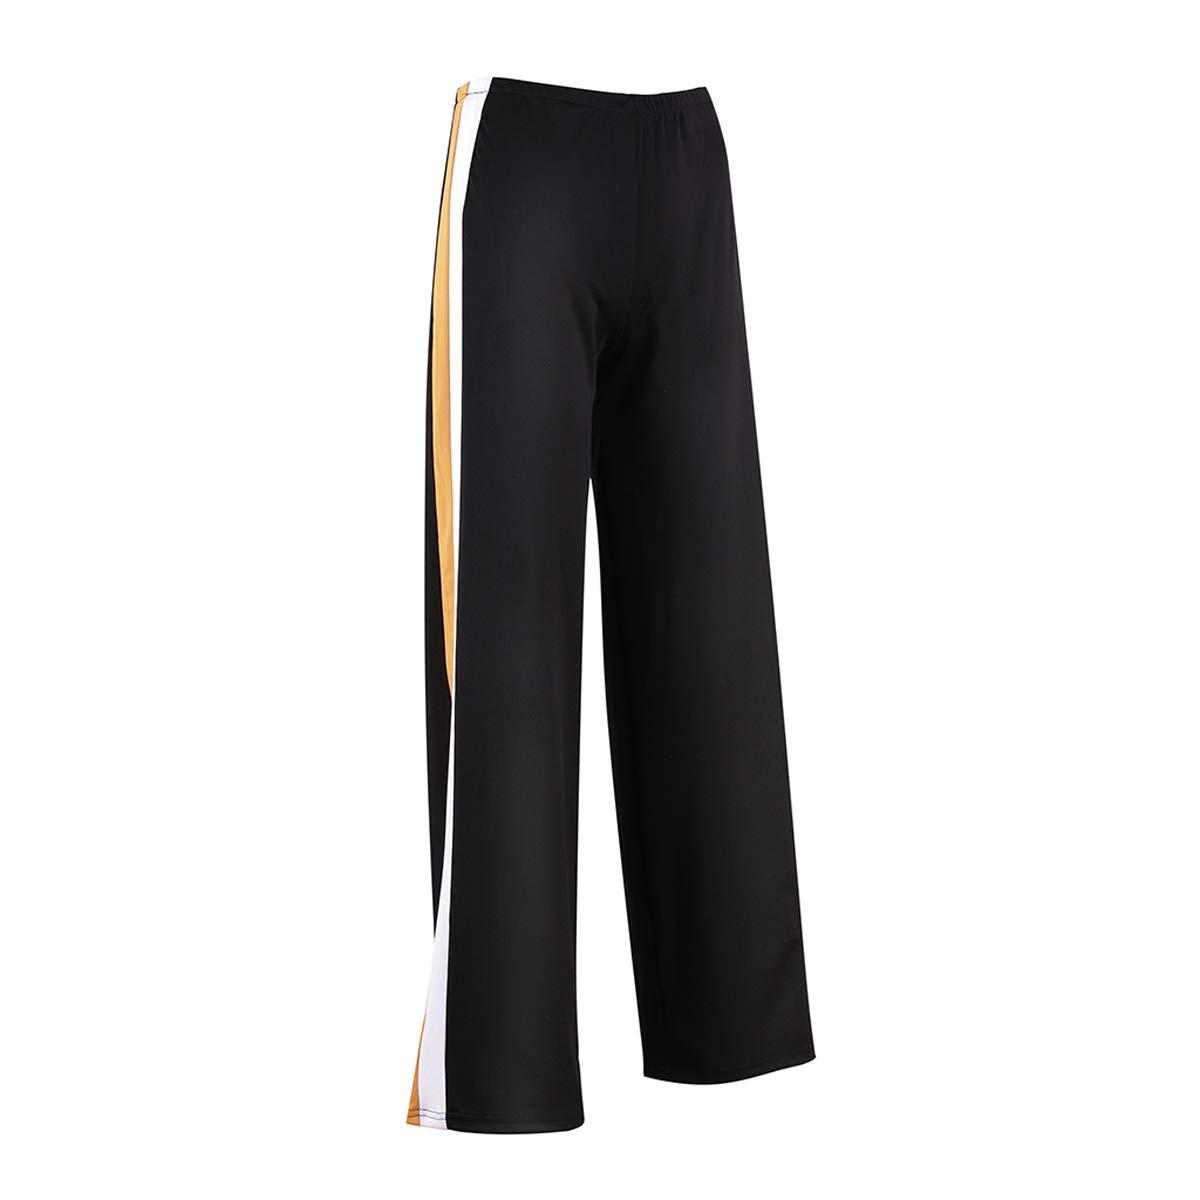 Dzień dobry Women Fashion High Waist Both Side with Stripe Loose Casual Long Pants Trousers (Black, S)